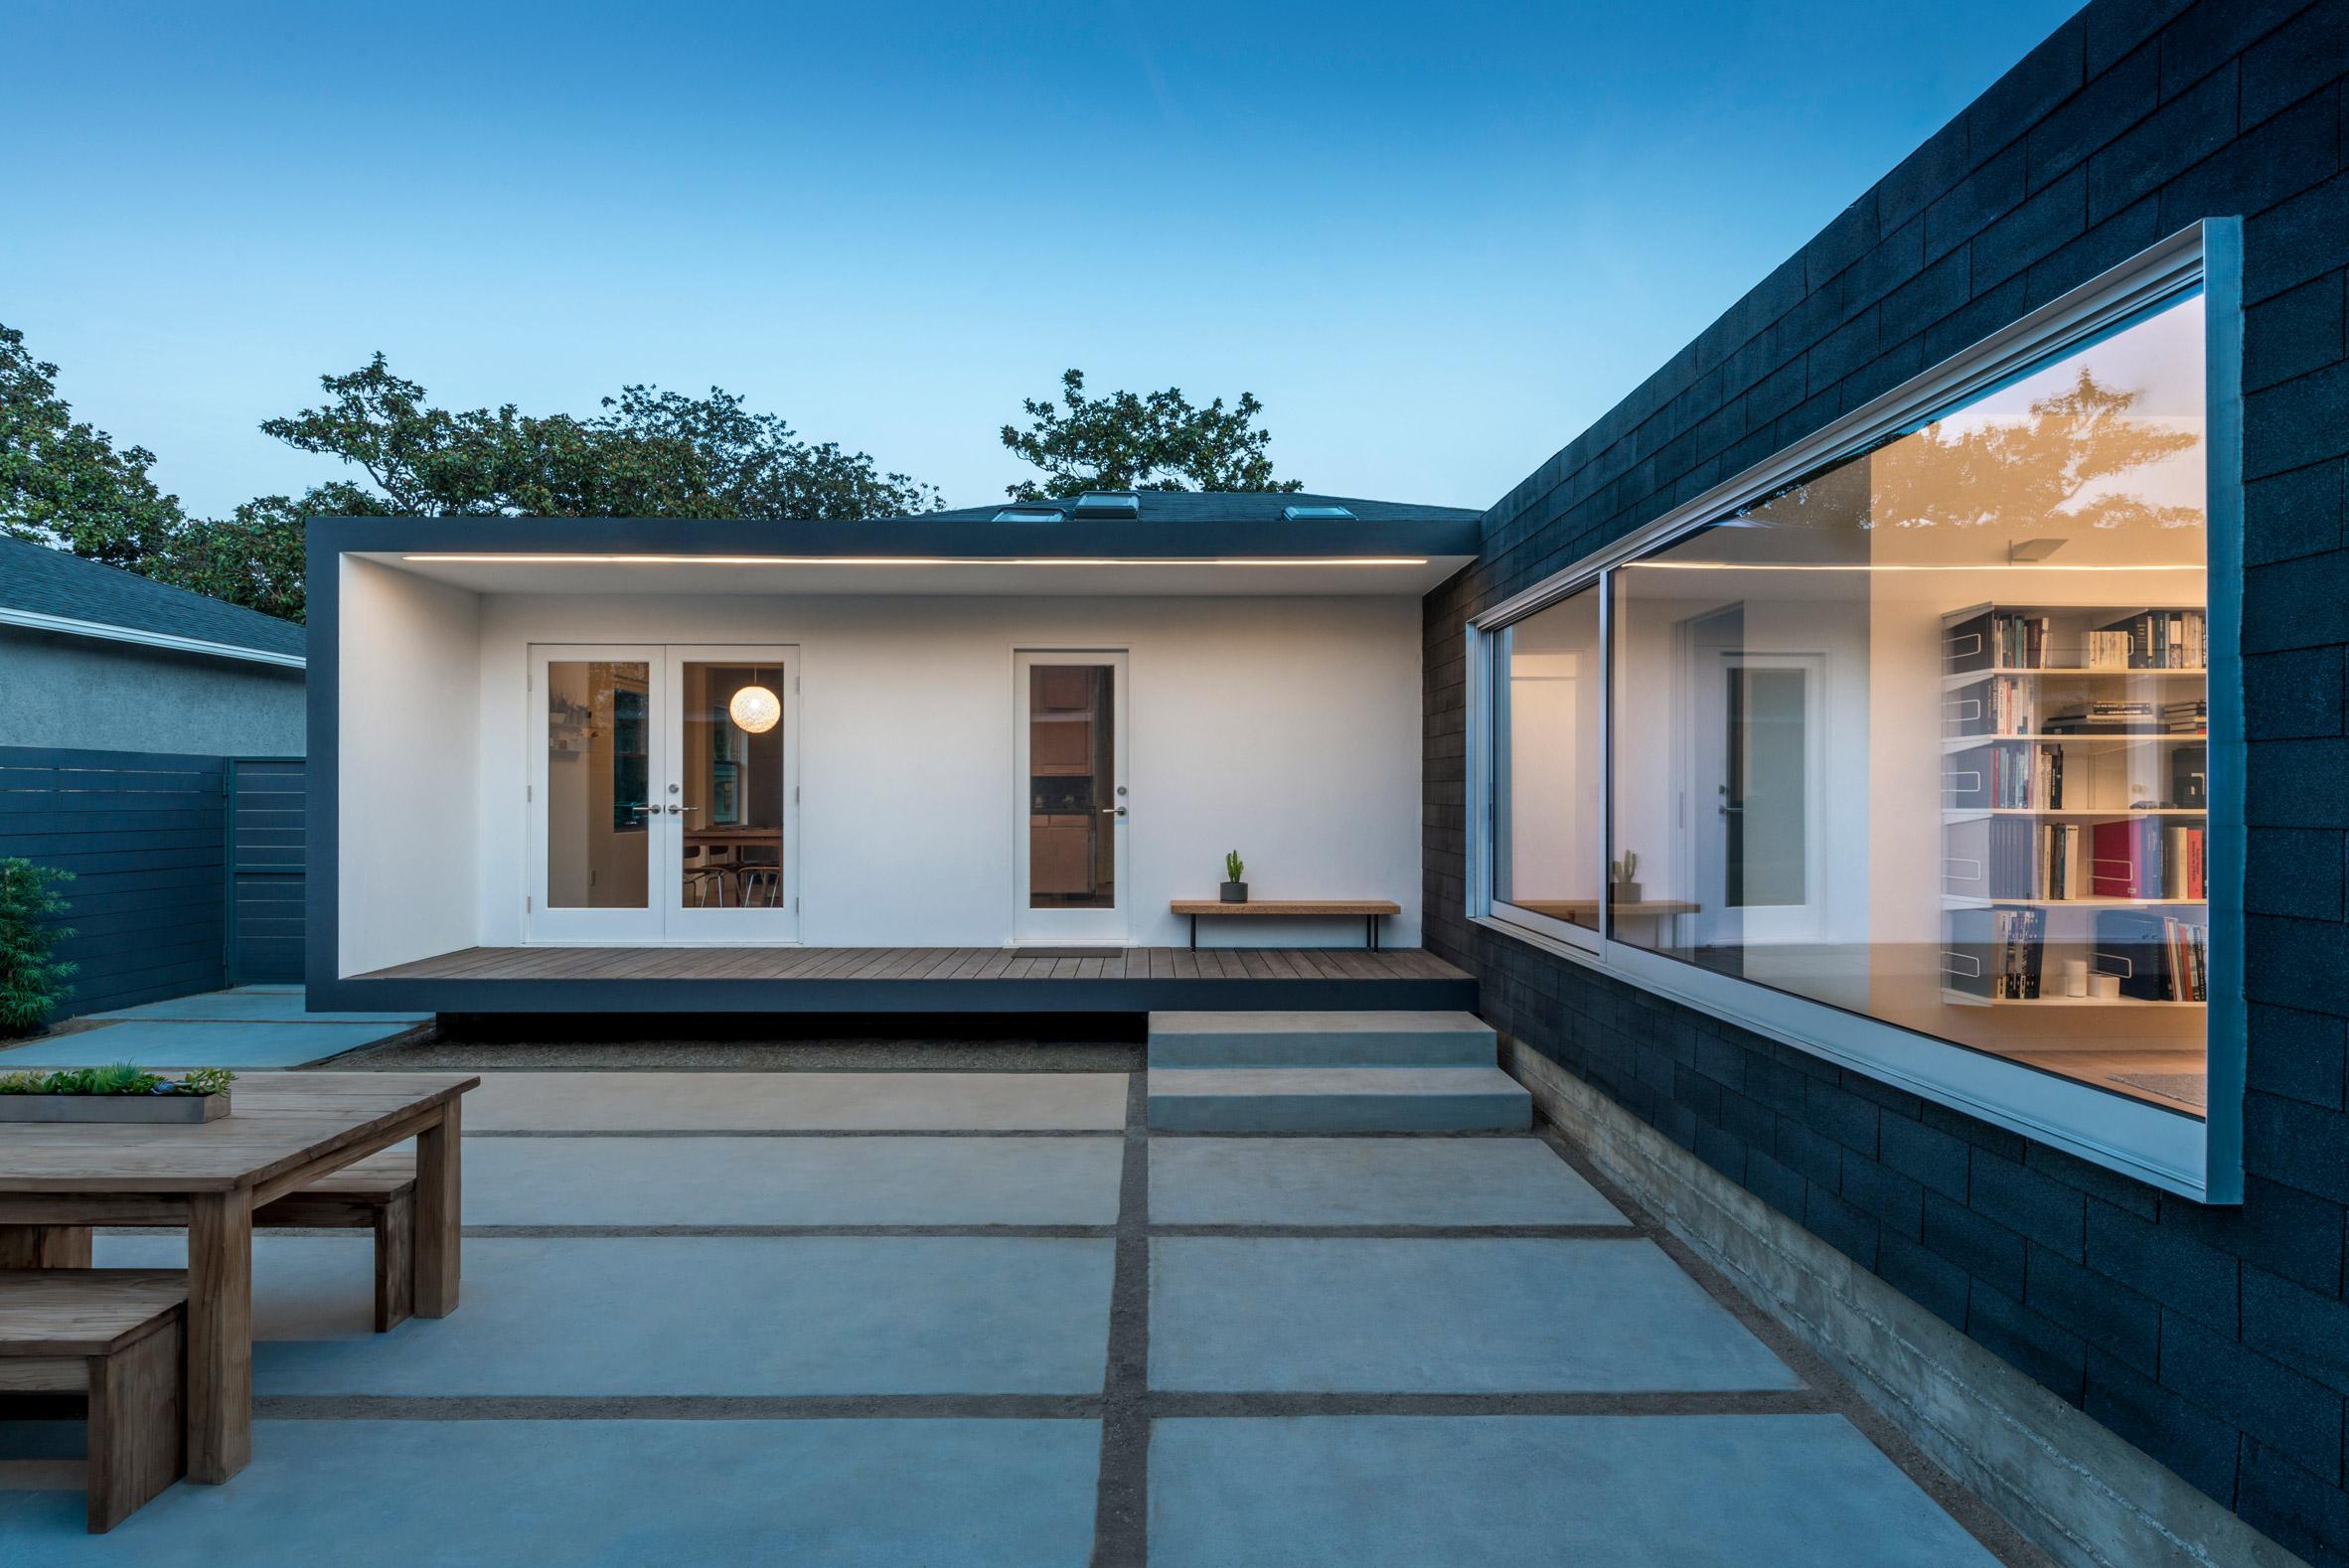 Thiết kế resort Bungalow 2